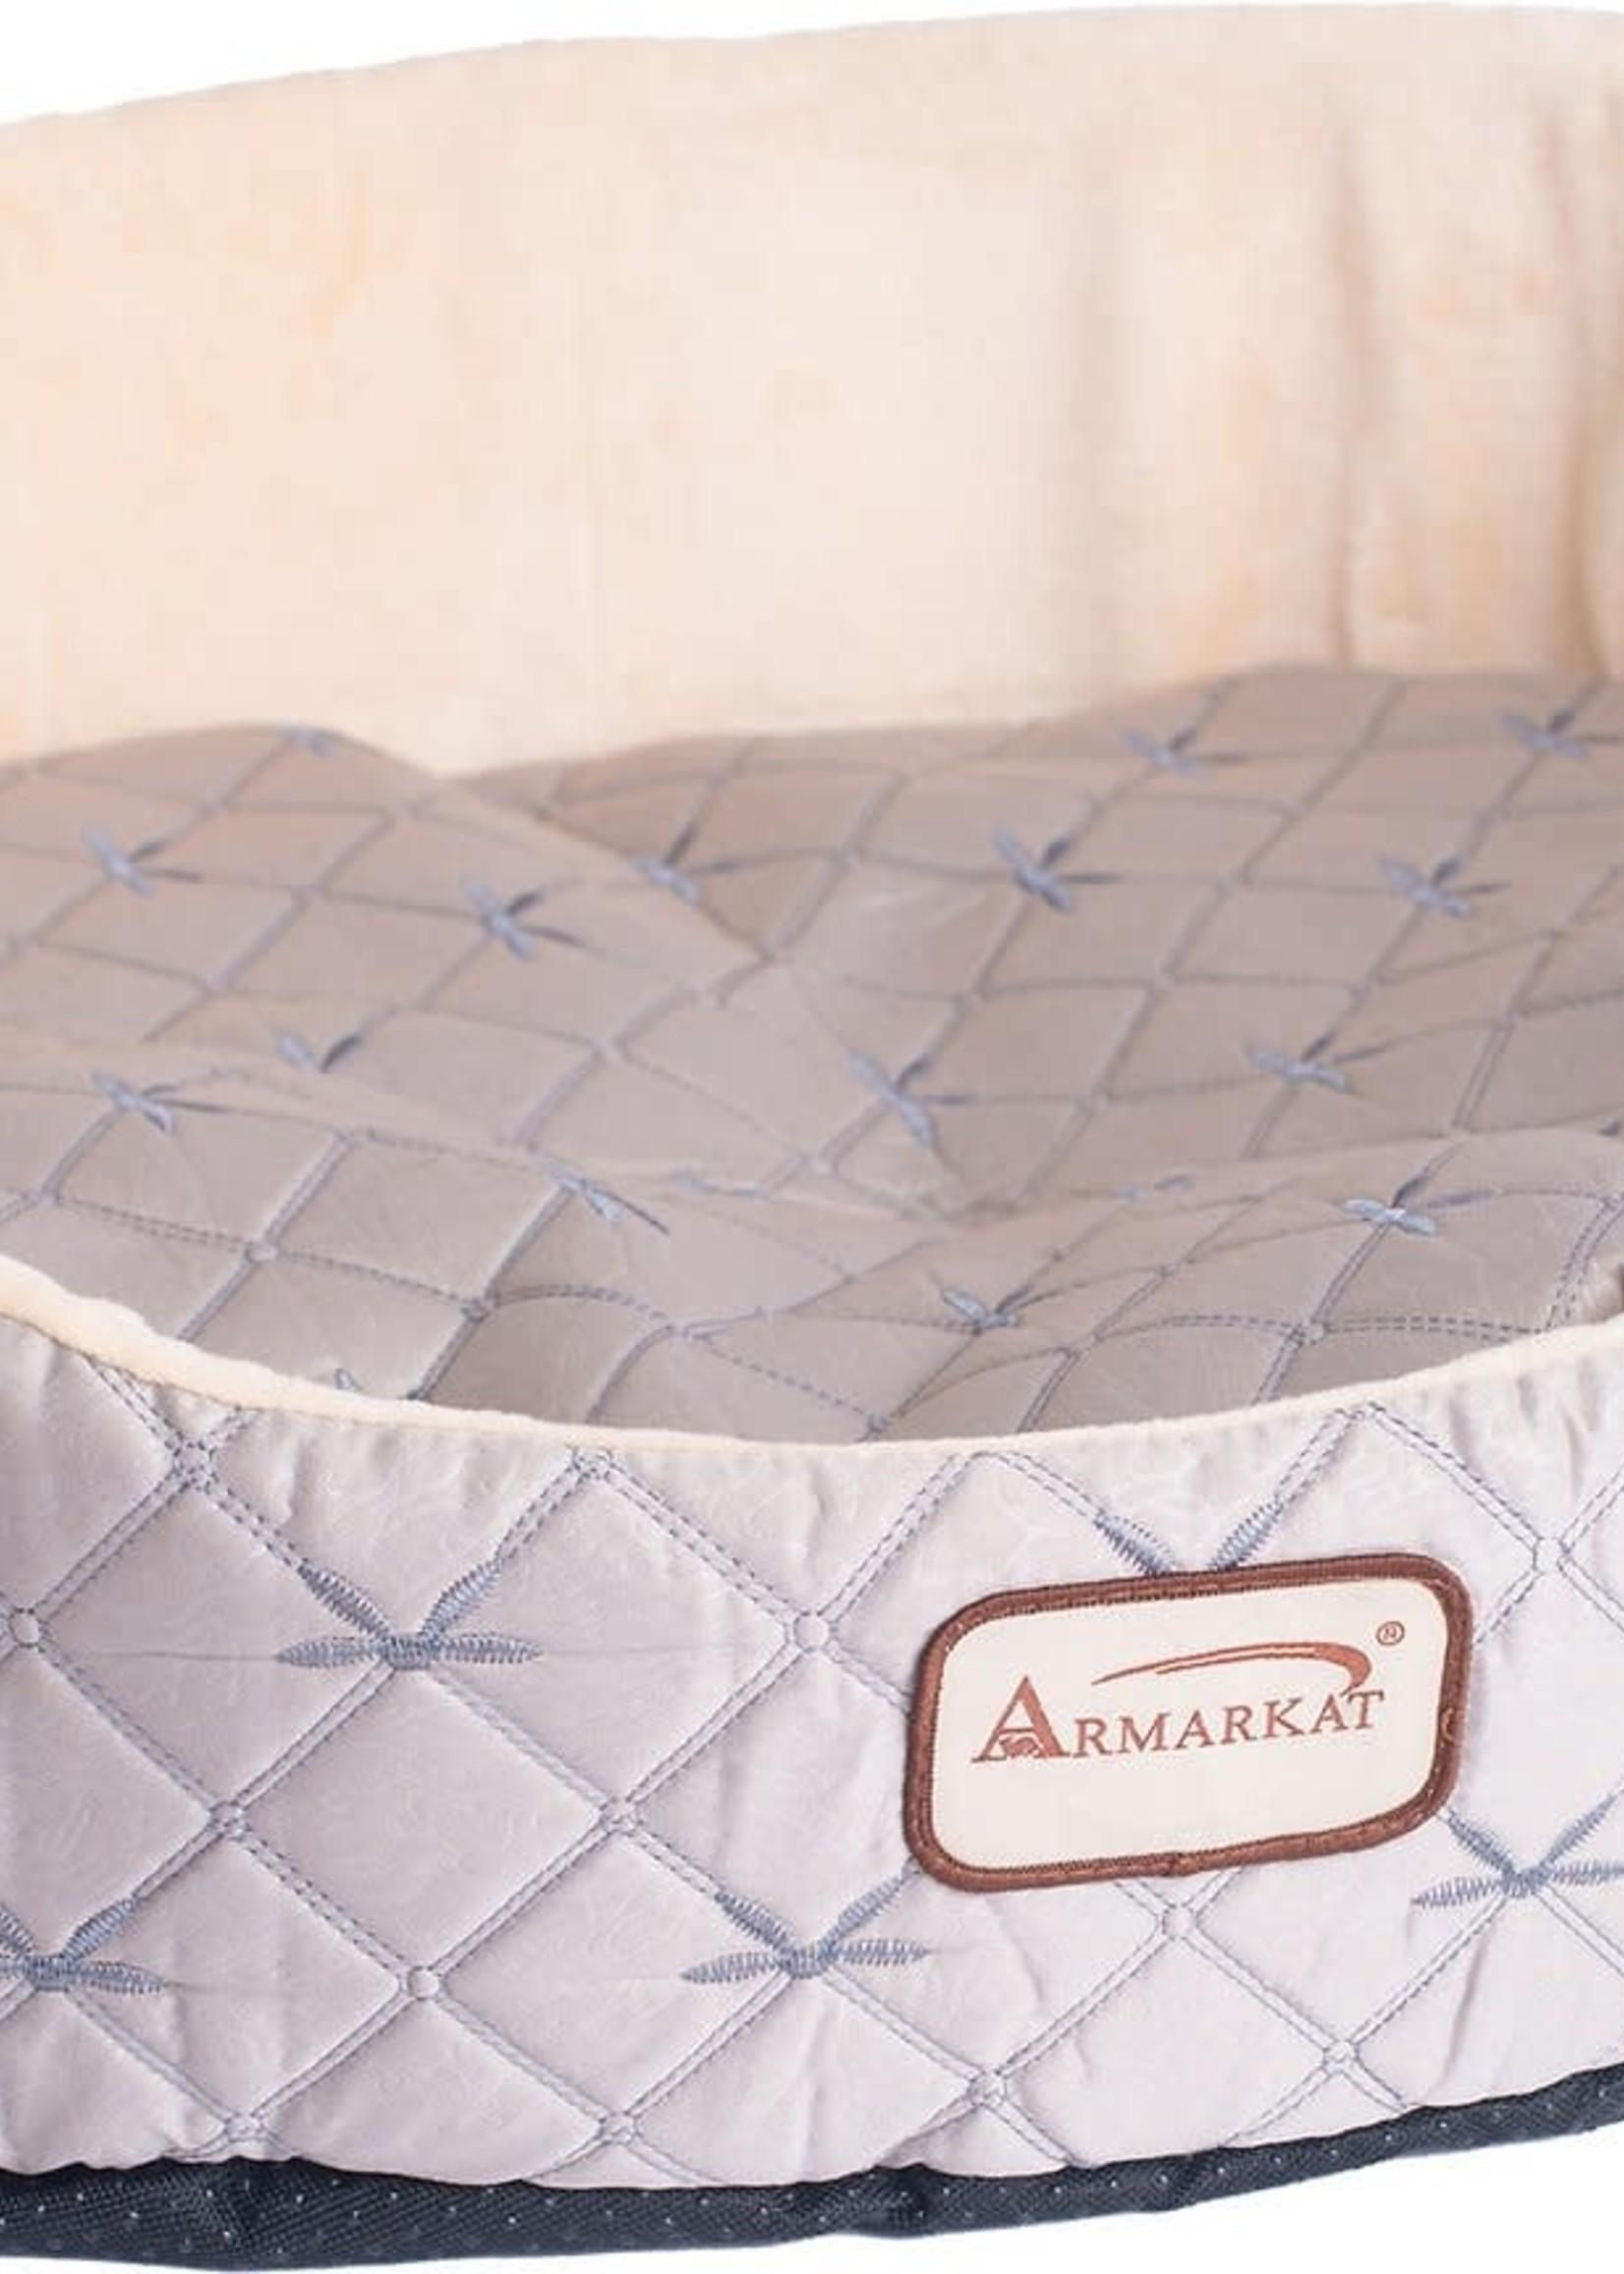 Armarkat Armarkat Oval Cuddle Nest Lounger Pet Bed Pale Silver & Beige